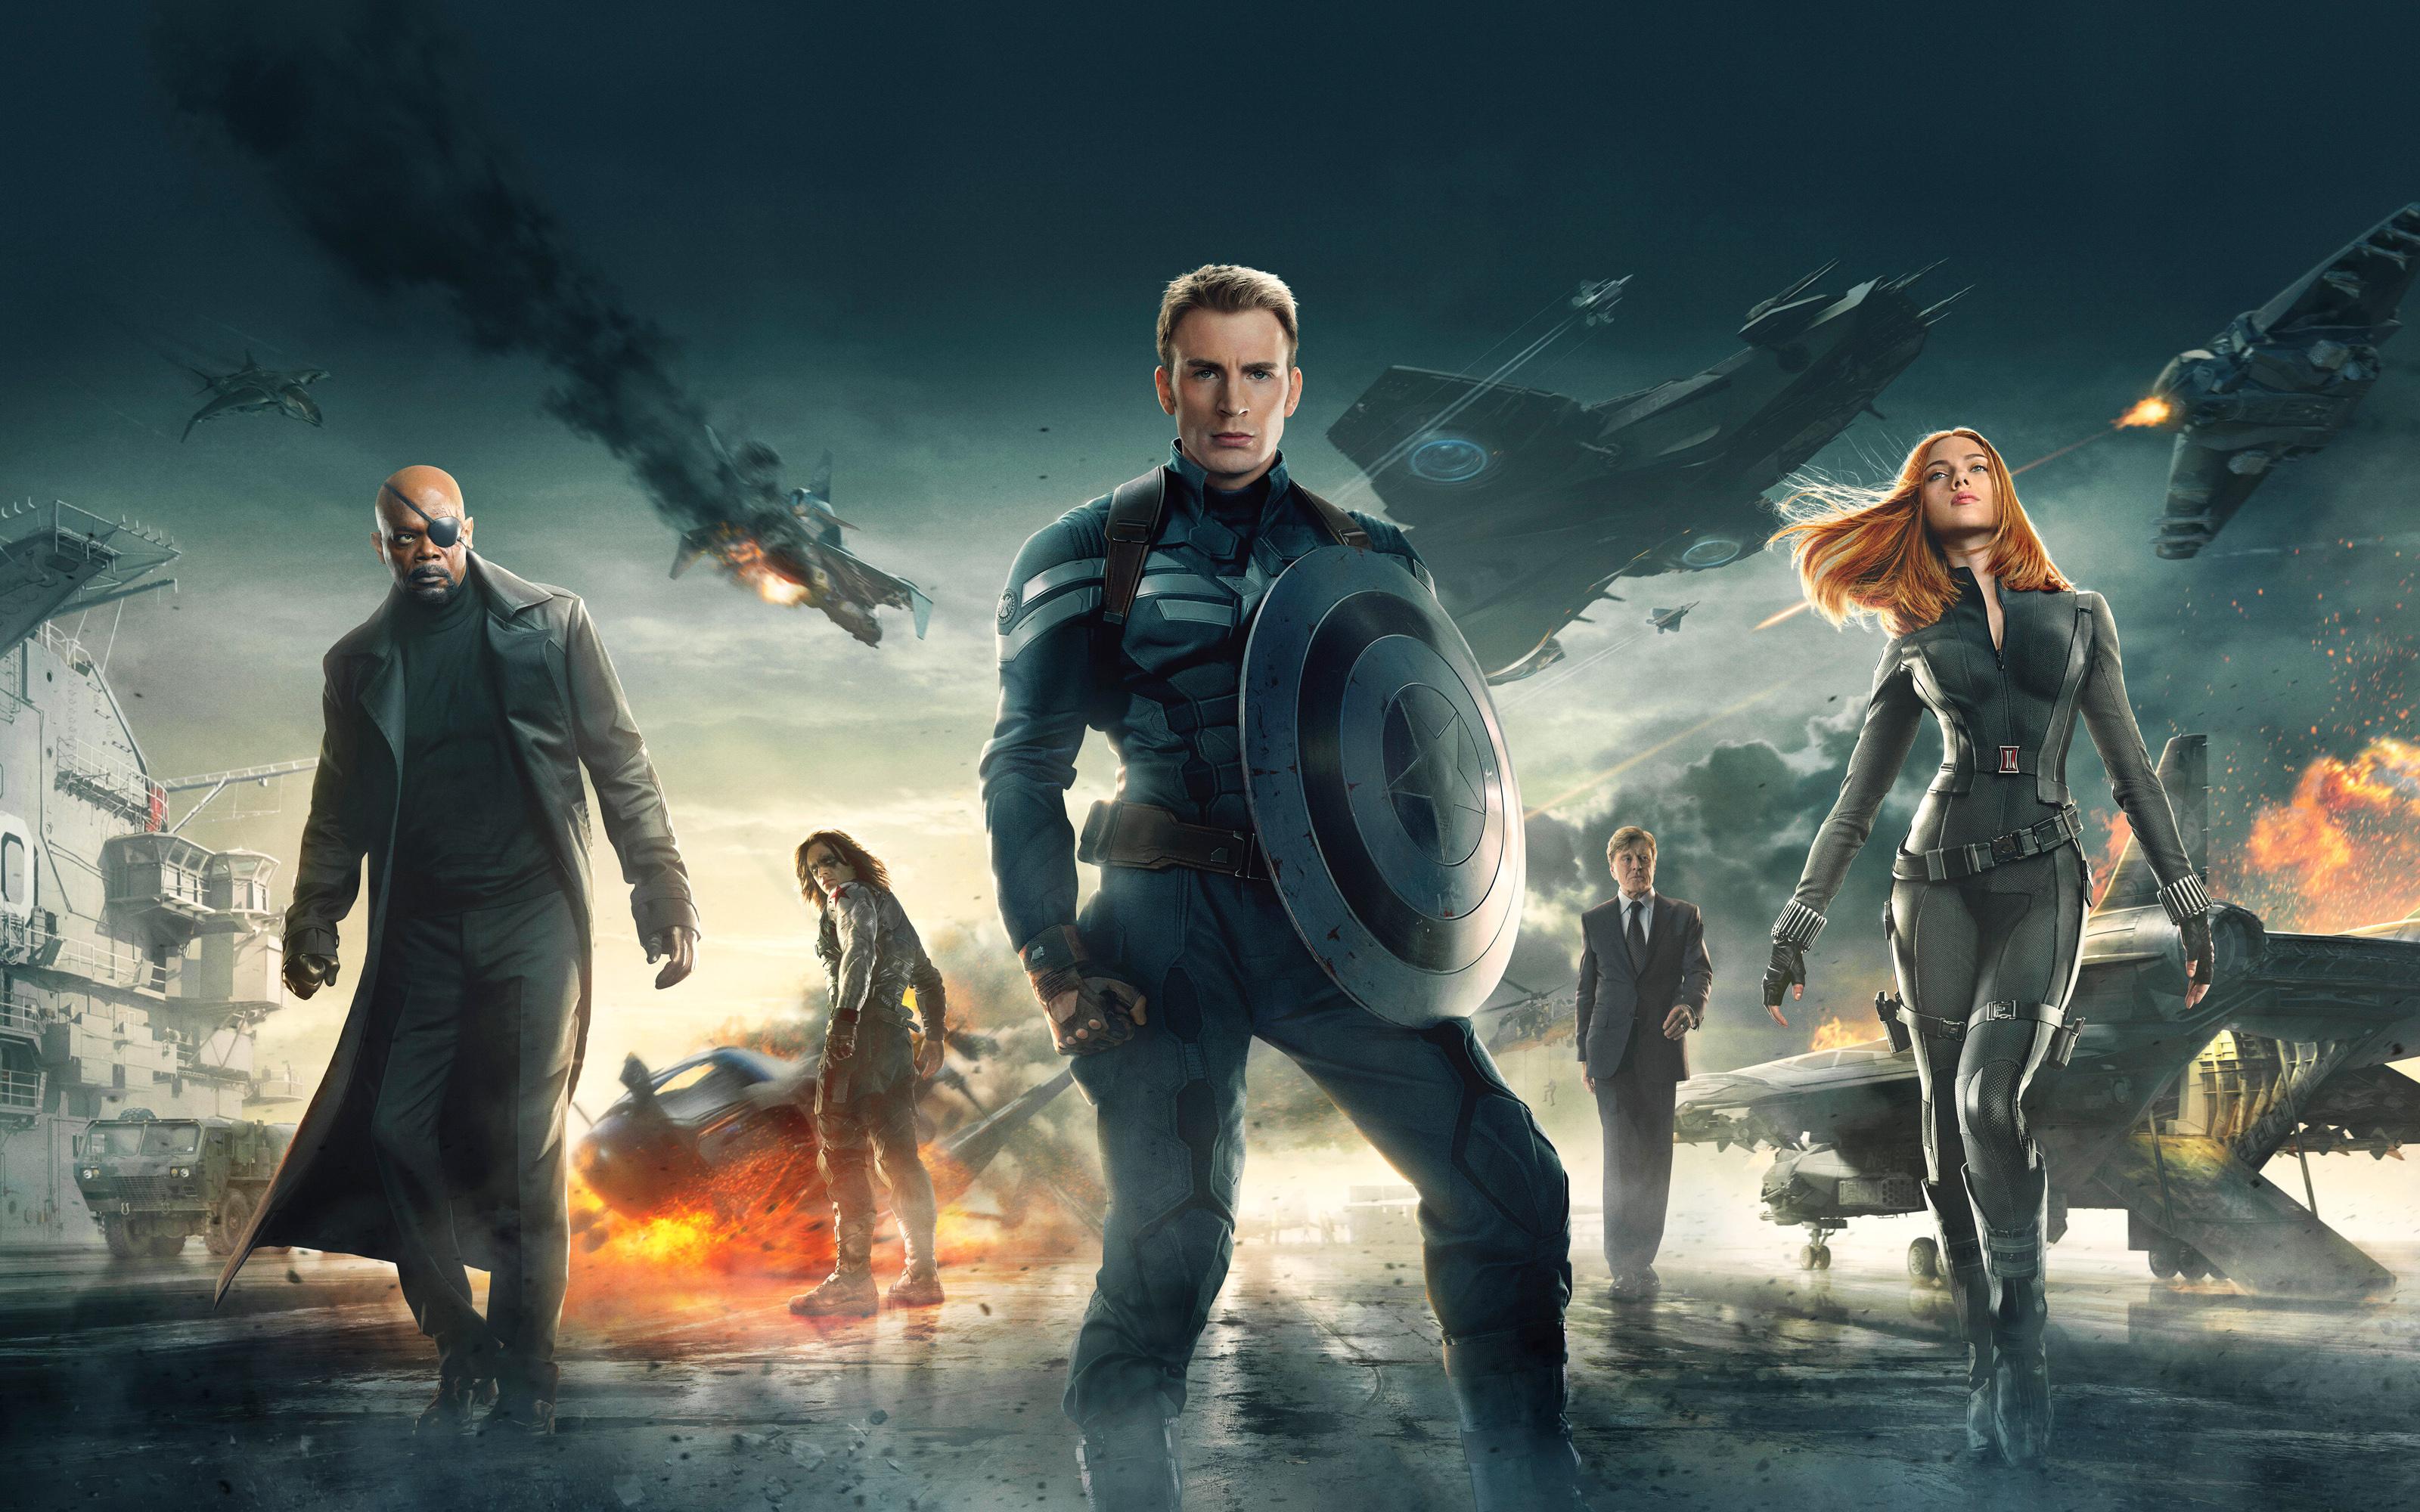 Captain America The Winter Soldier 2014 HD wallpaper